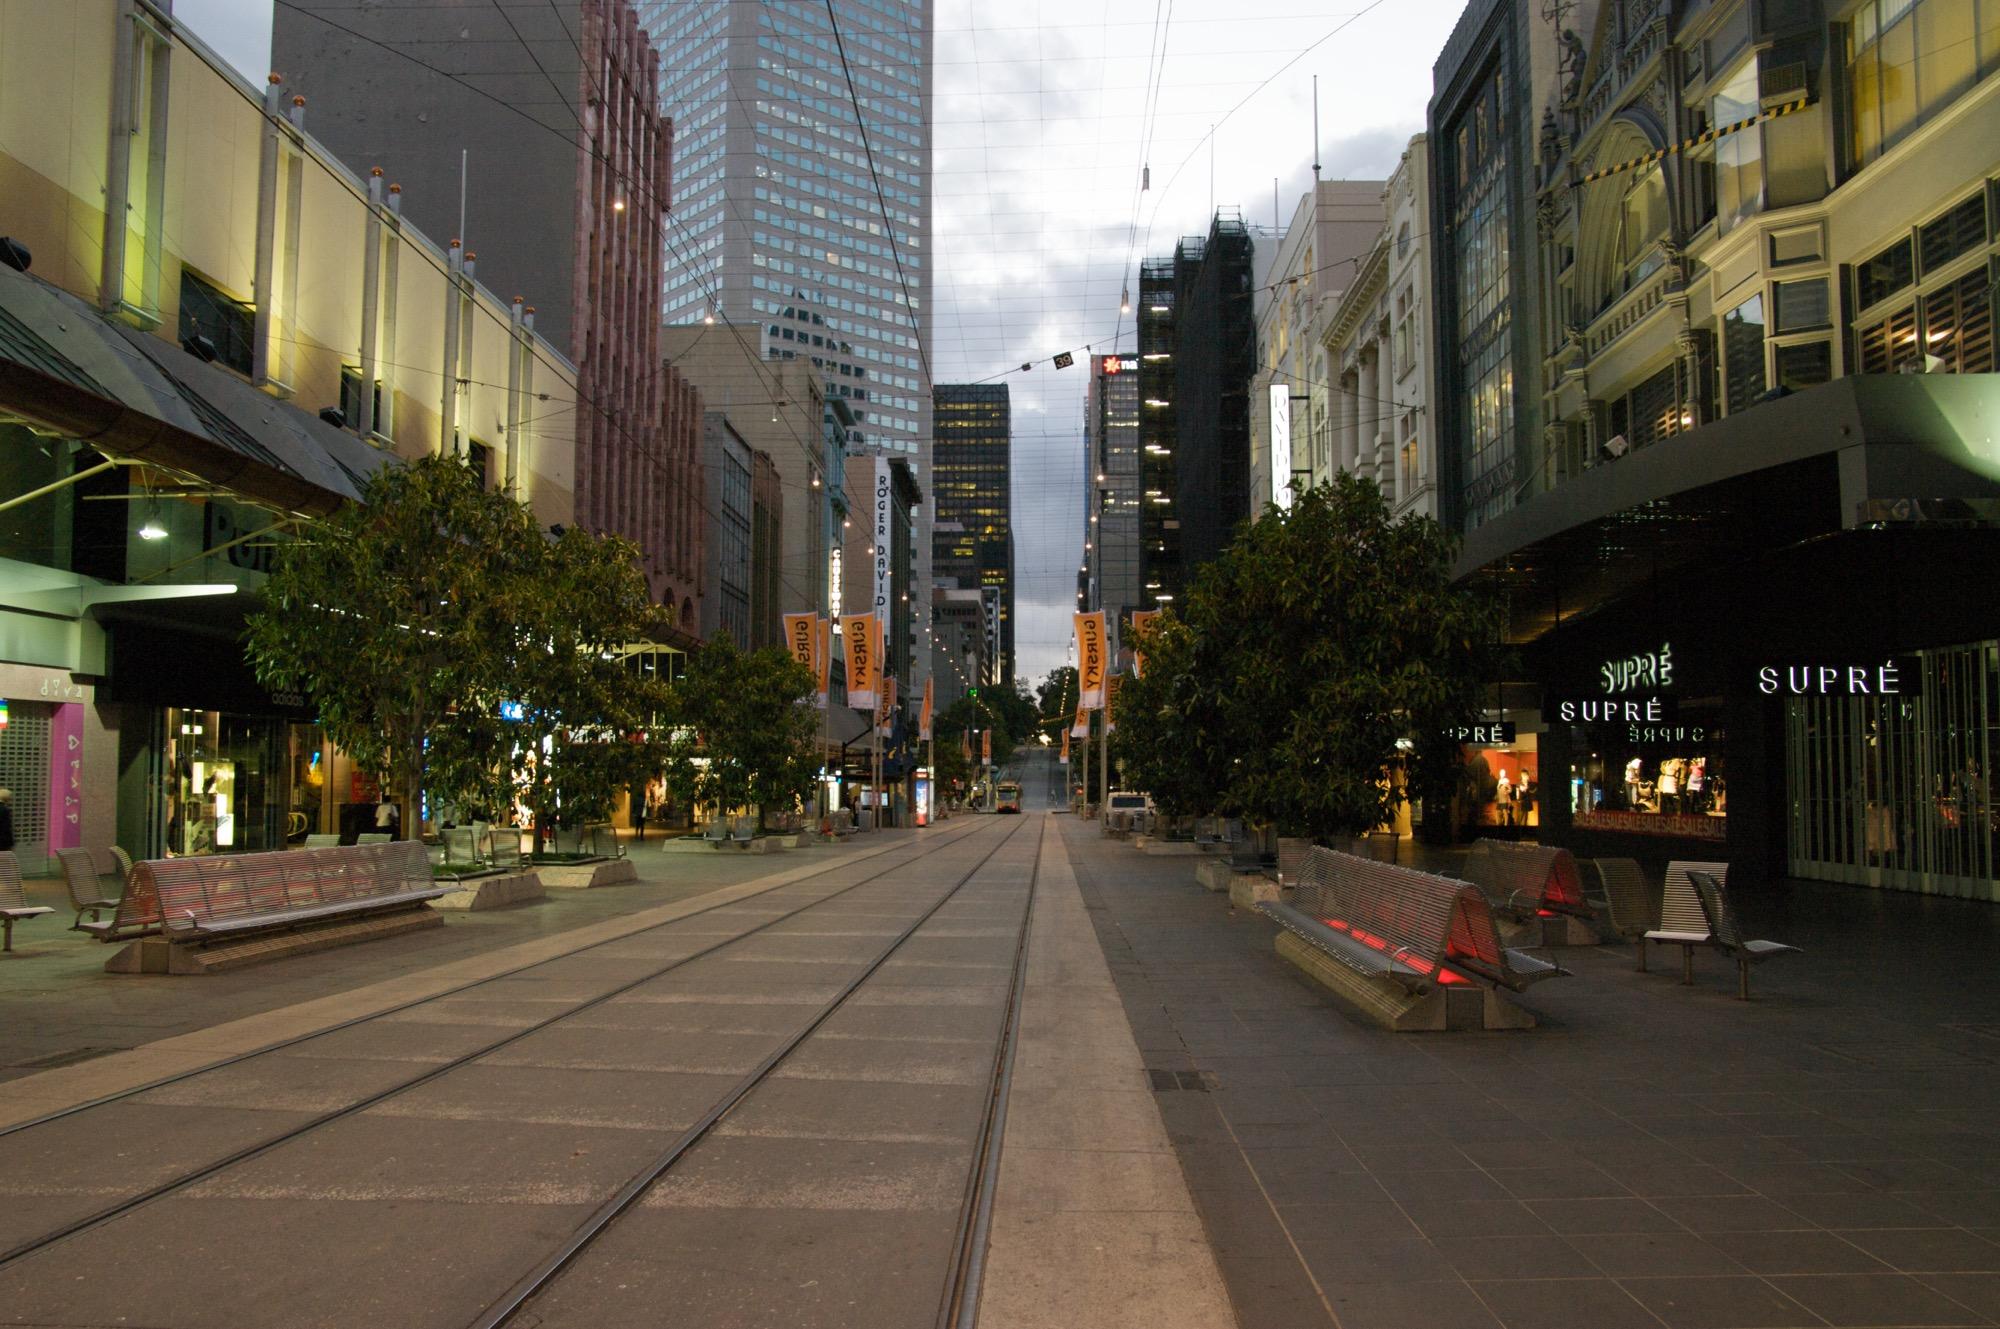 Melbourne stuff - 1 of 223 (125).jpg